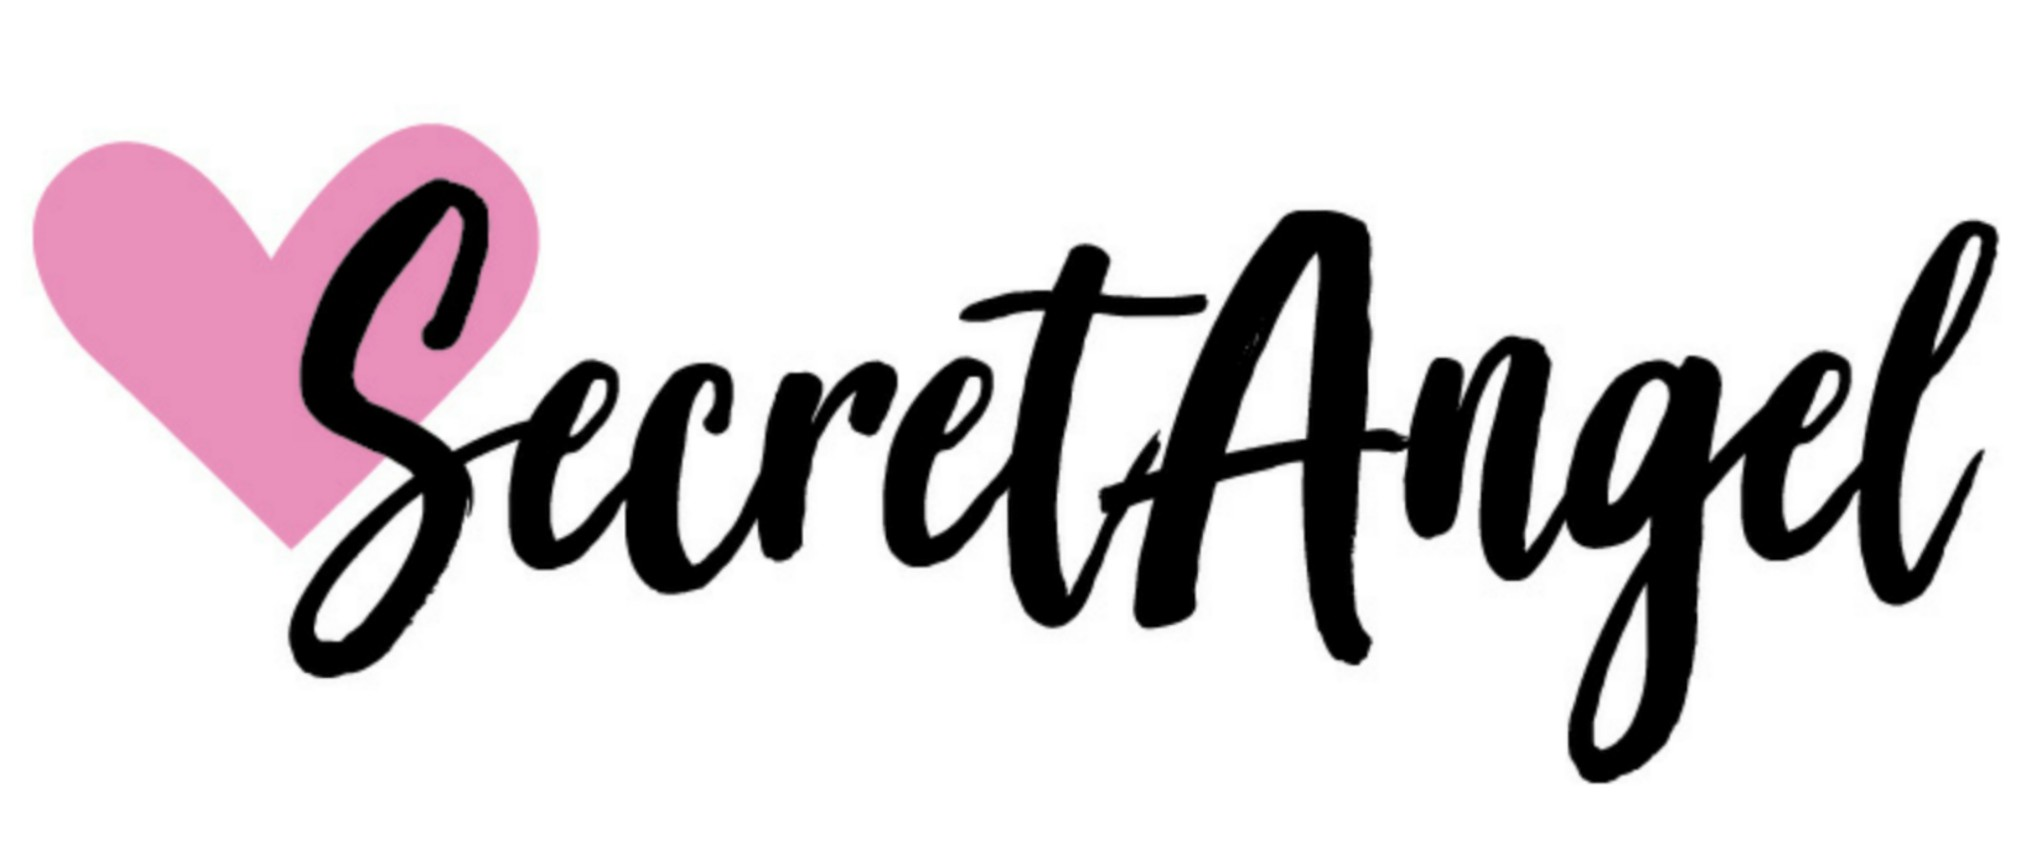 Secret AngeL